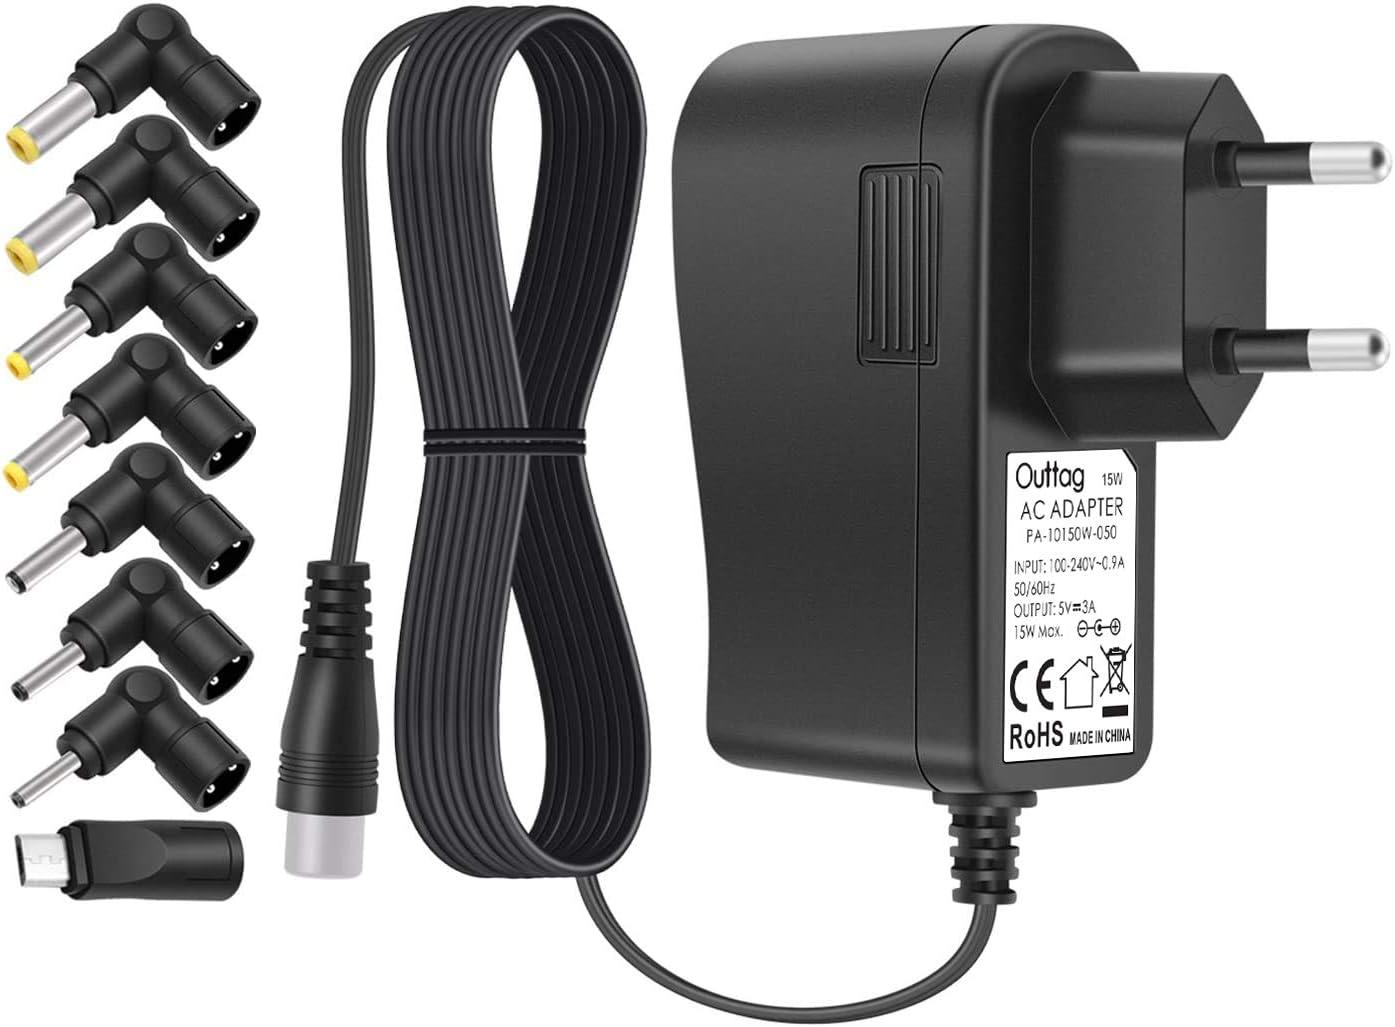 Outtag - Cargador adaptador universal de 15 W, 5 V, 3 A, fuente de alimentación con 8 conectores para router Bluetooth, altavoces, Kindle, cámaras de radio DVR Power Bank Scanner